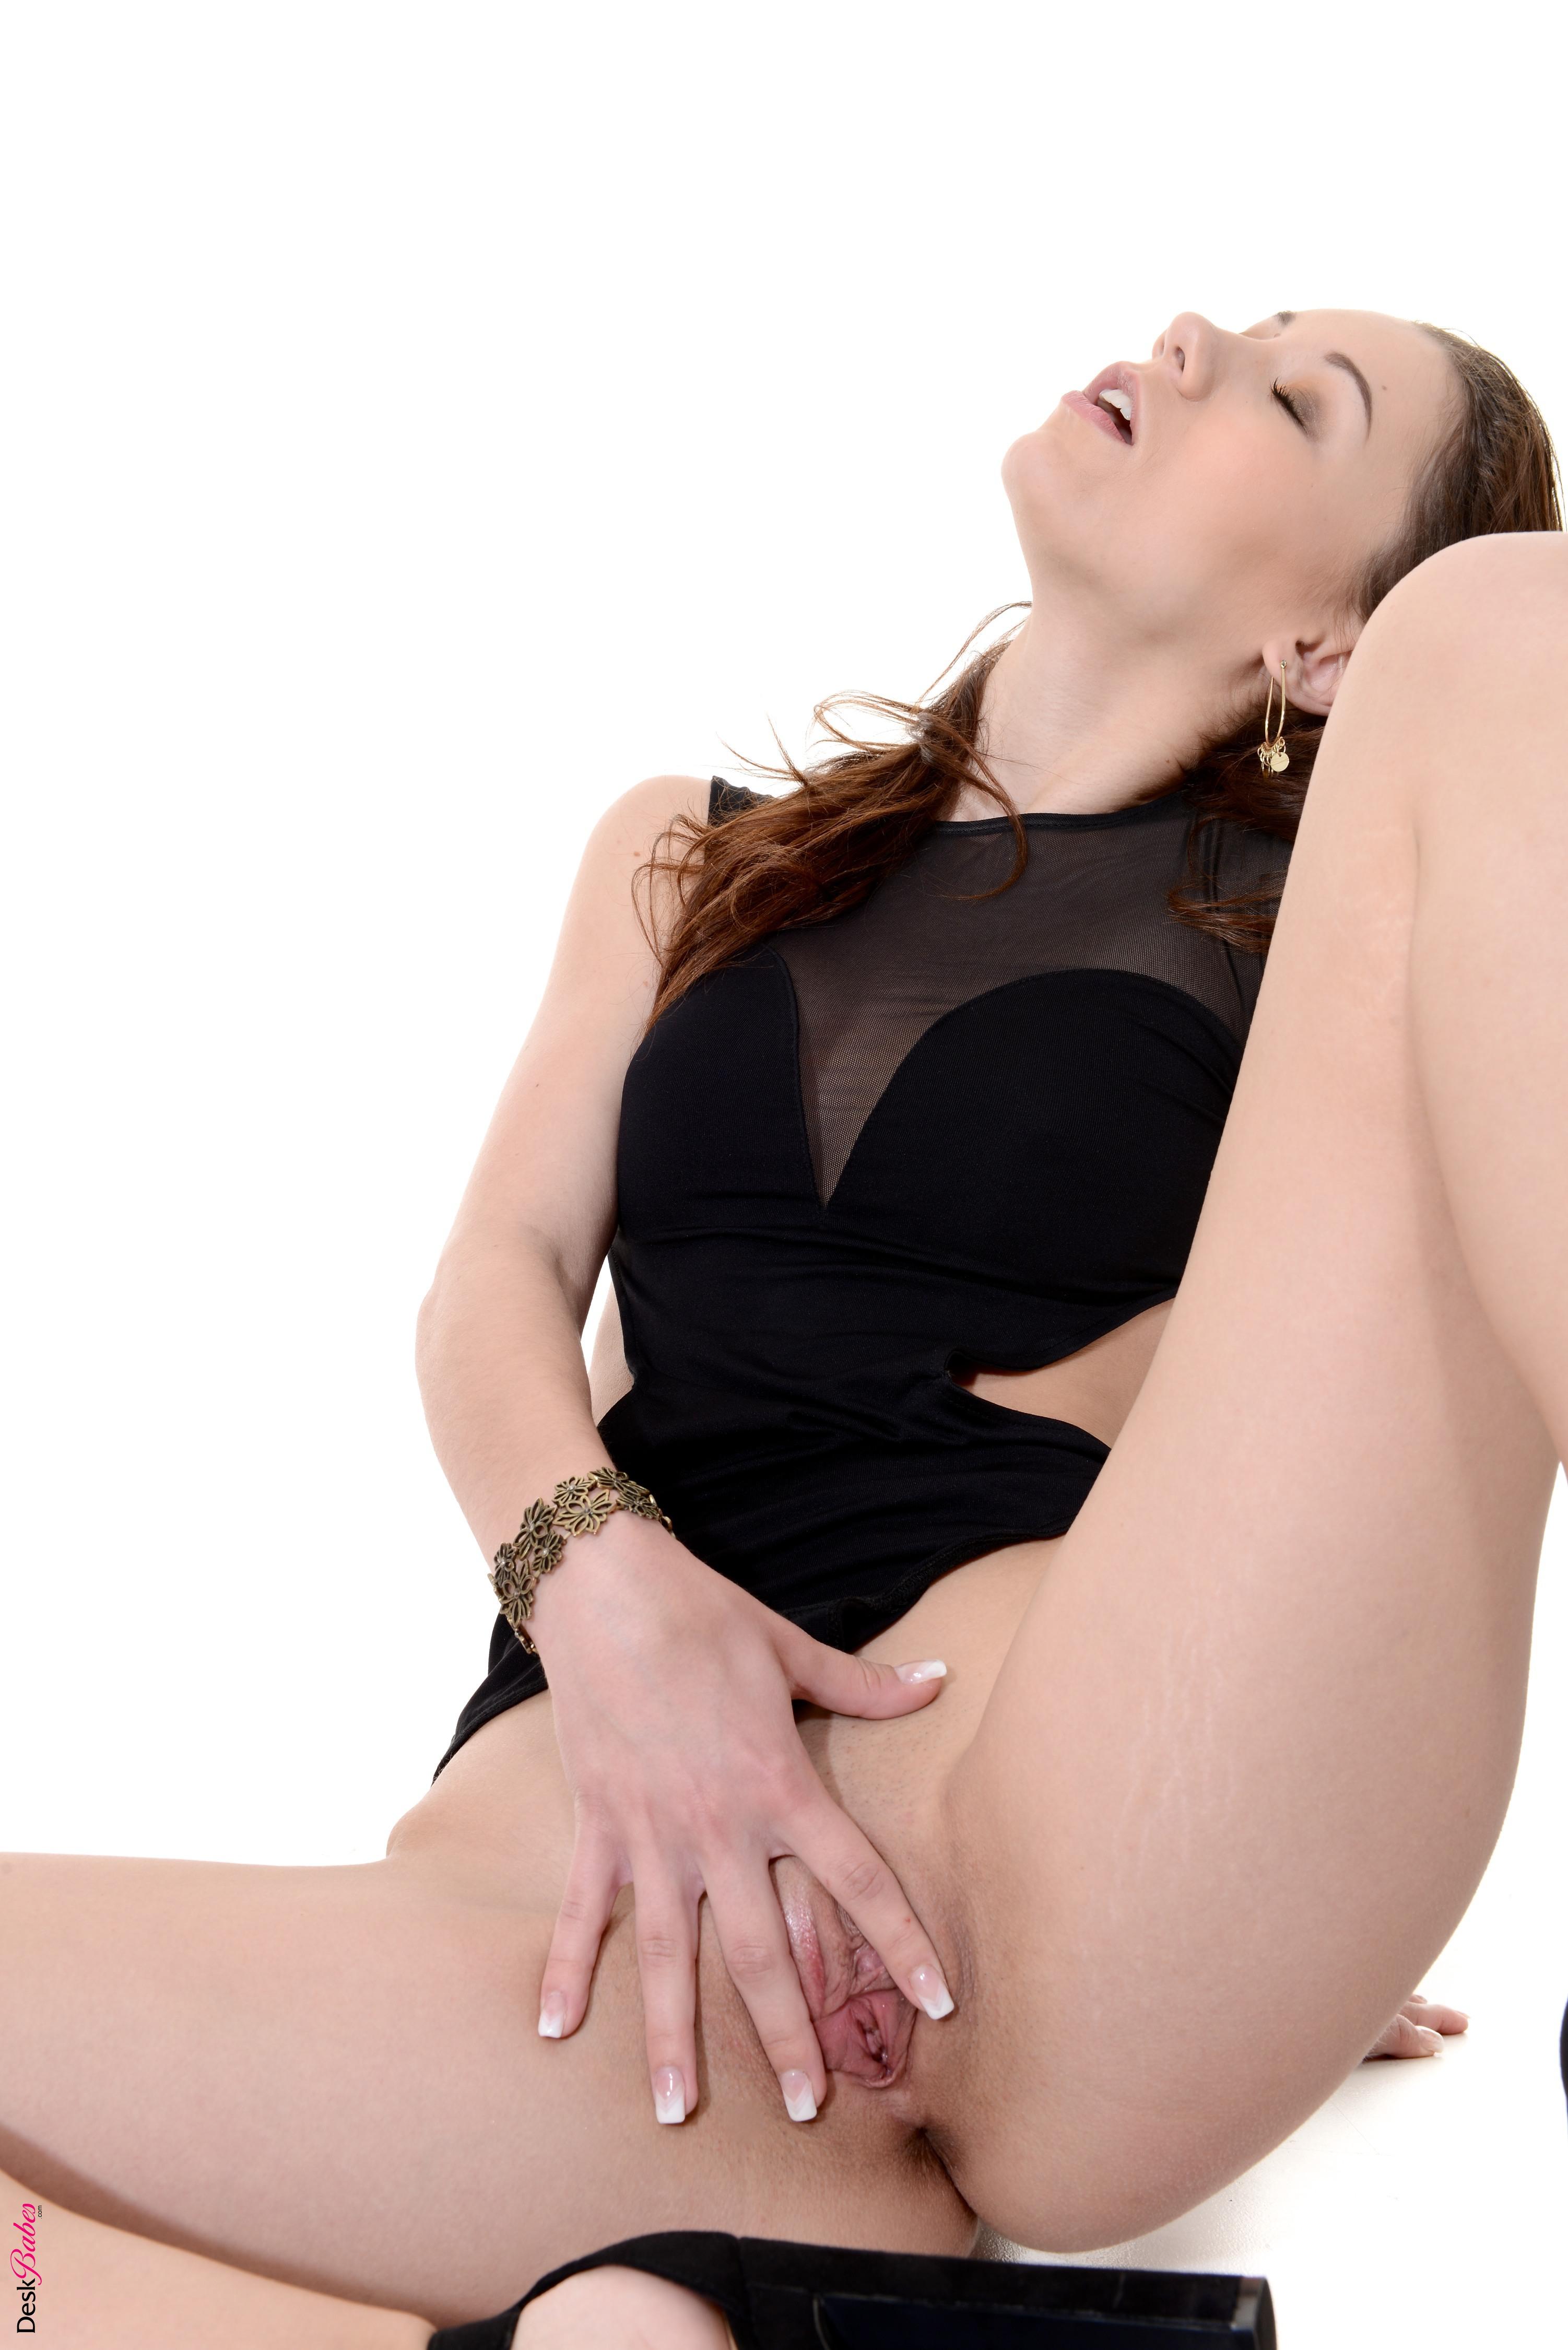 Aika May Porn desk babes aika may 272406 - good sex porn